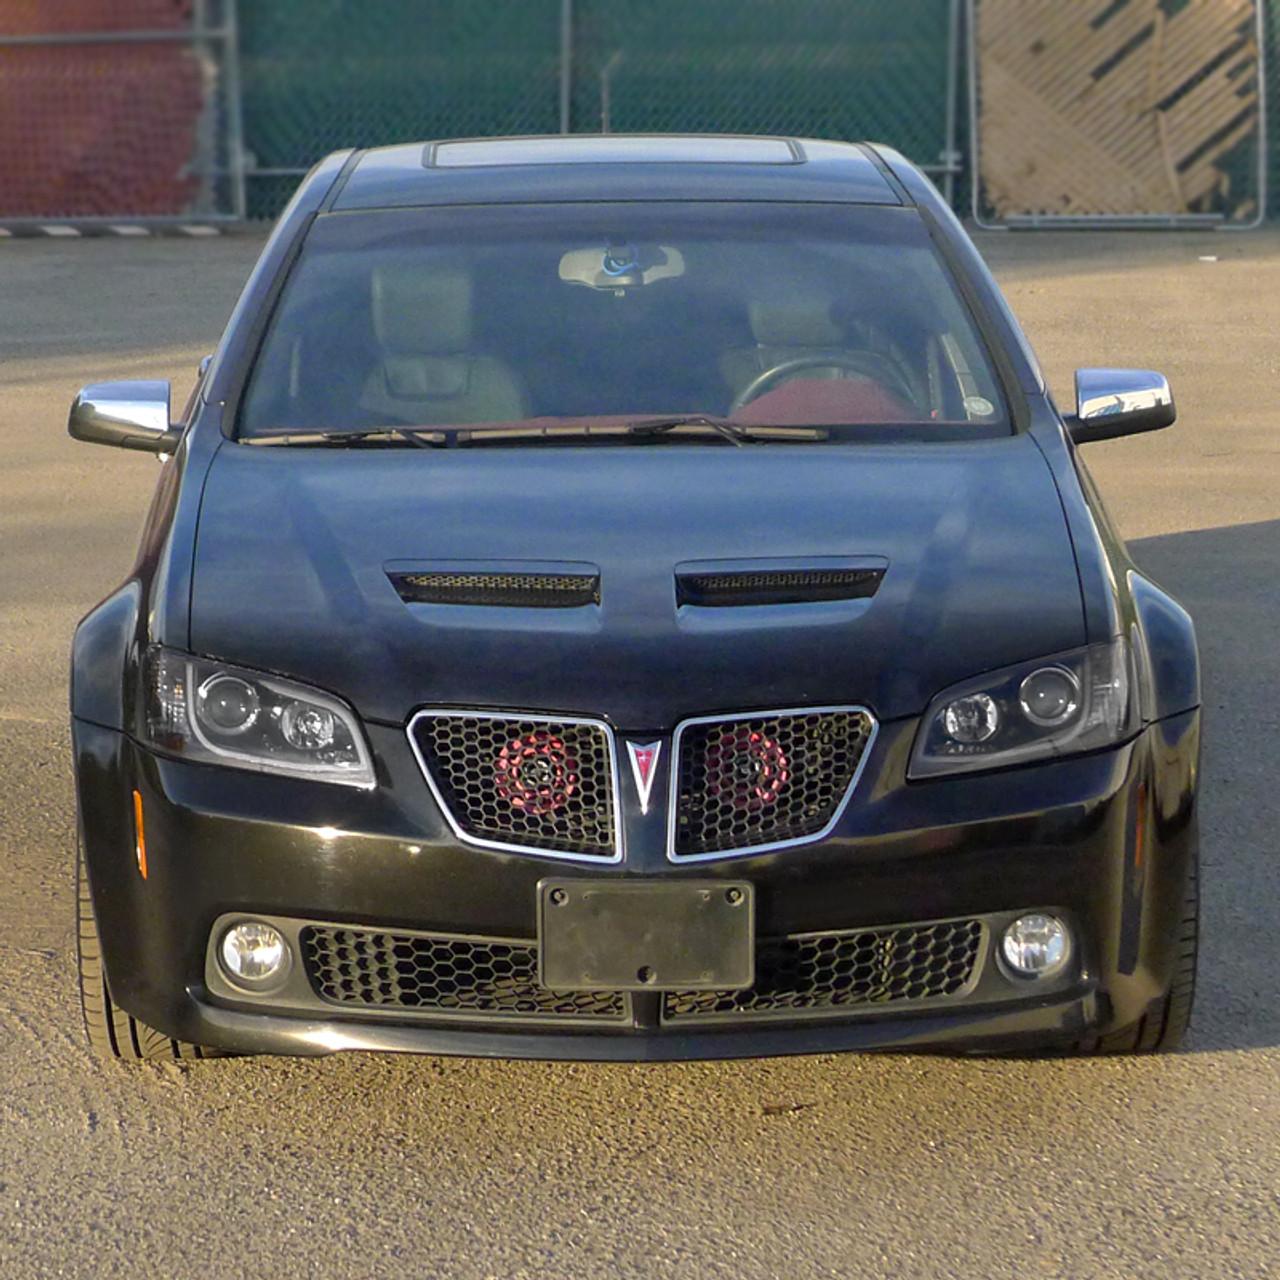 2008 2009 pontiac g8 led projector headlights matte black housing clear lens spec d tuning 2008 2009 pontiac g8 led projector